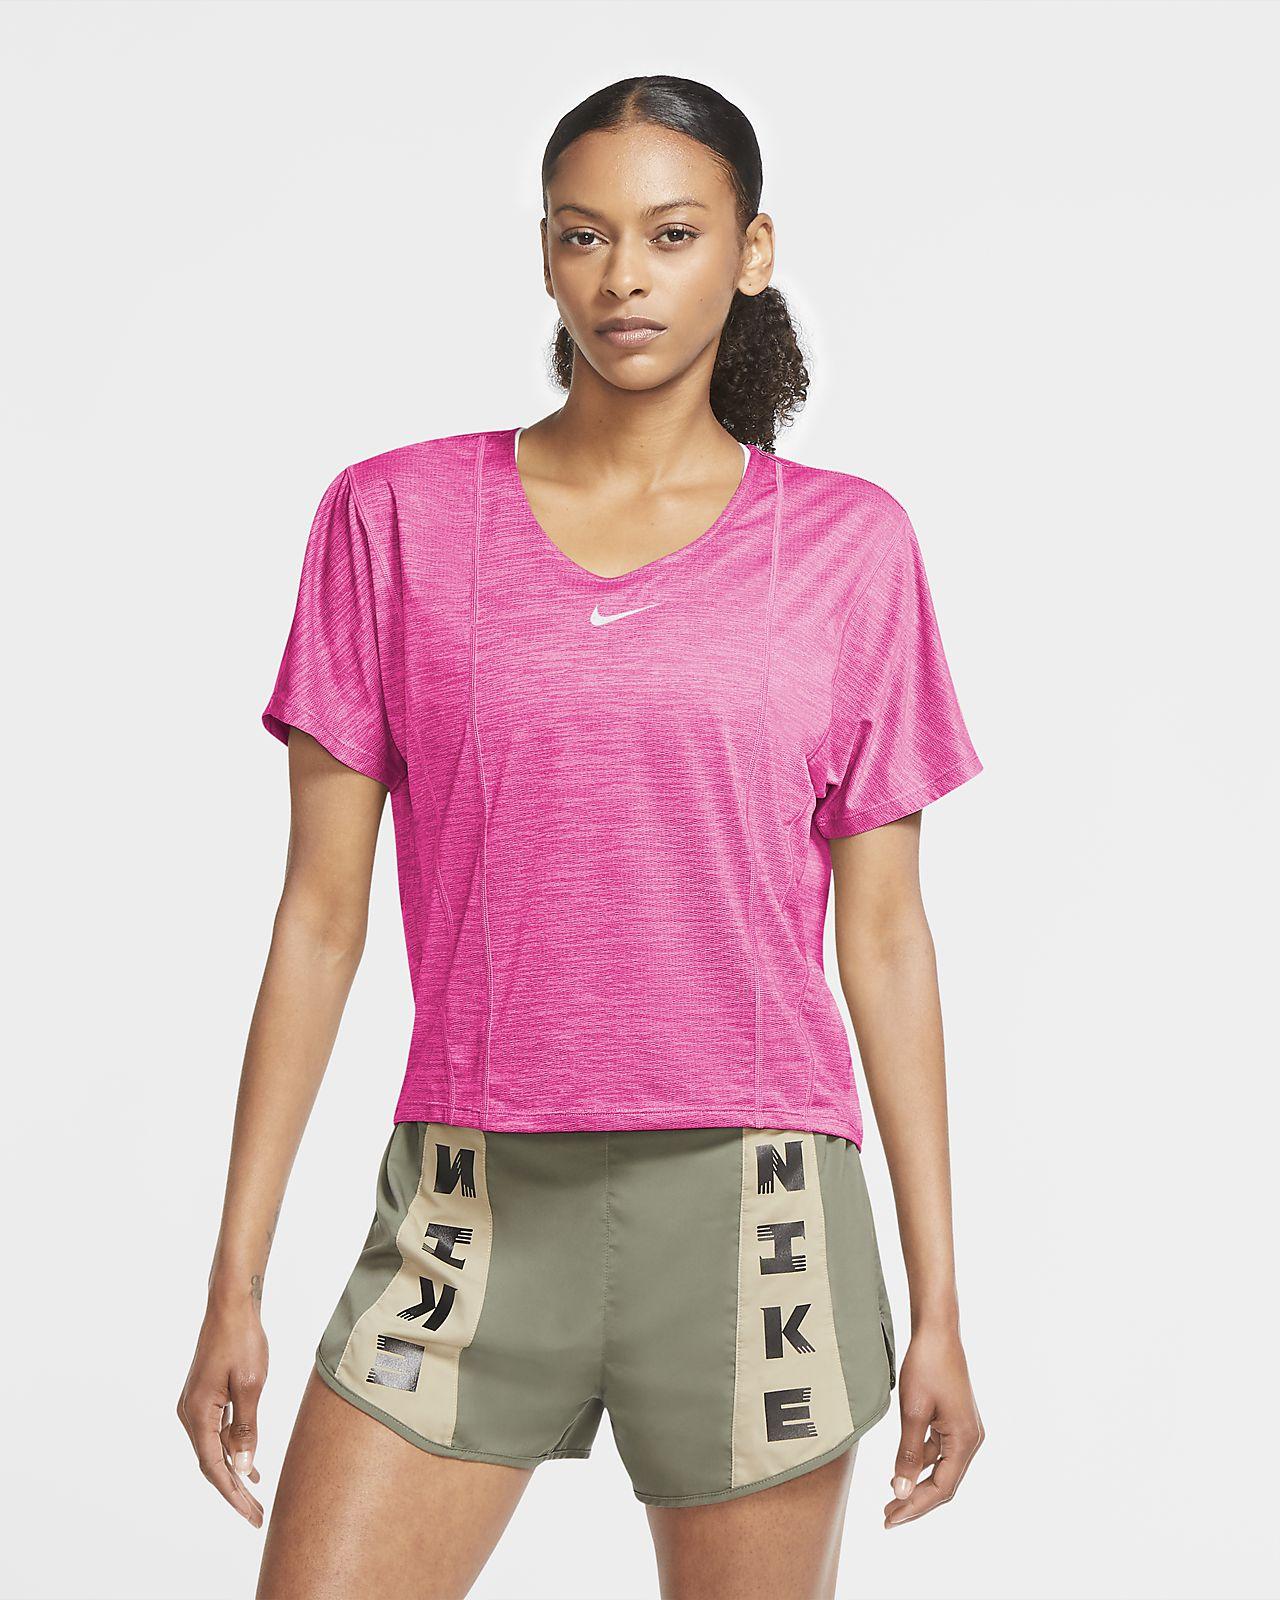 Löpartröja Nike Icon Clash City Sleek för kvinnor